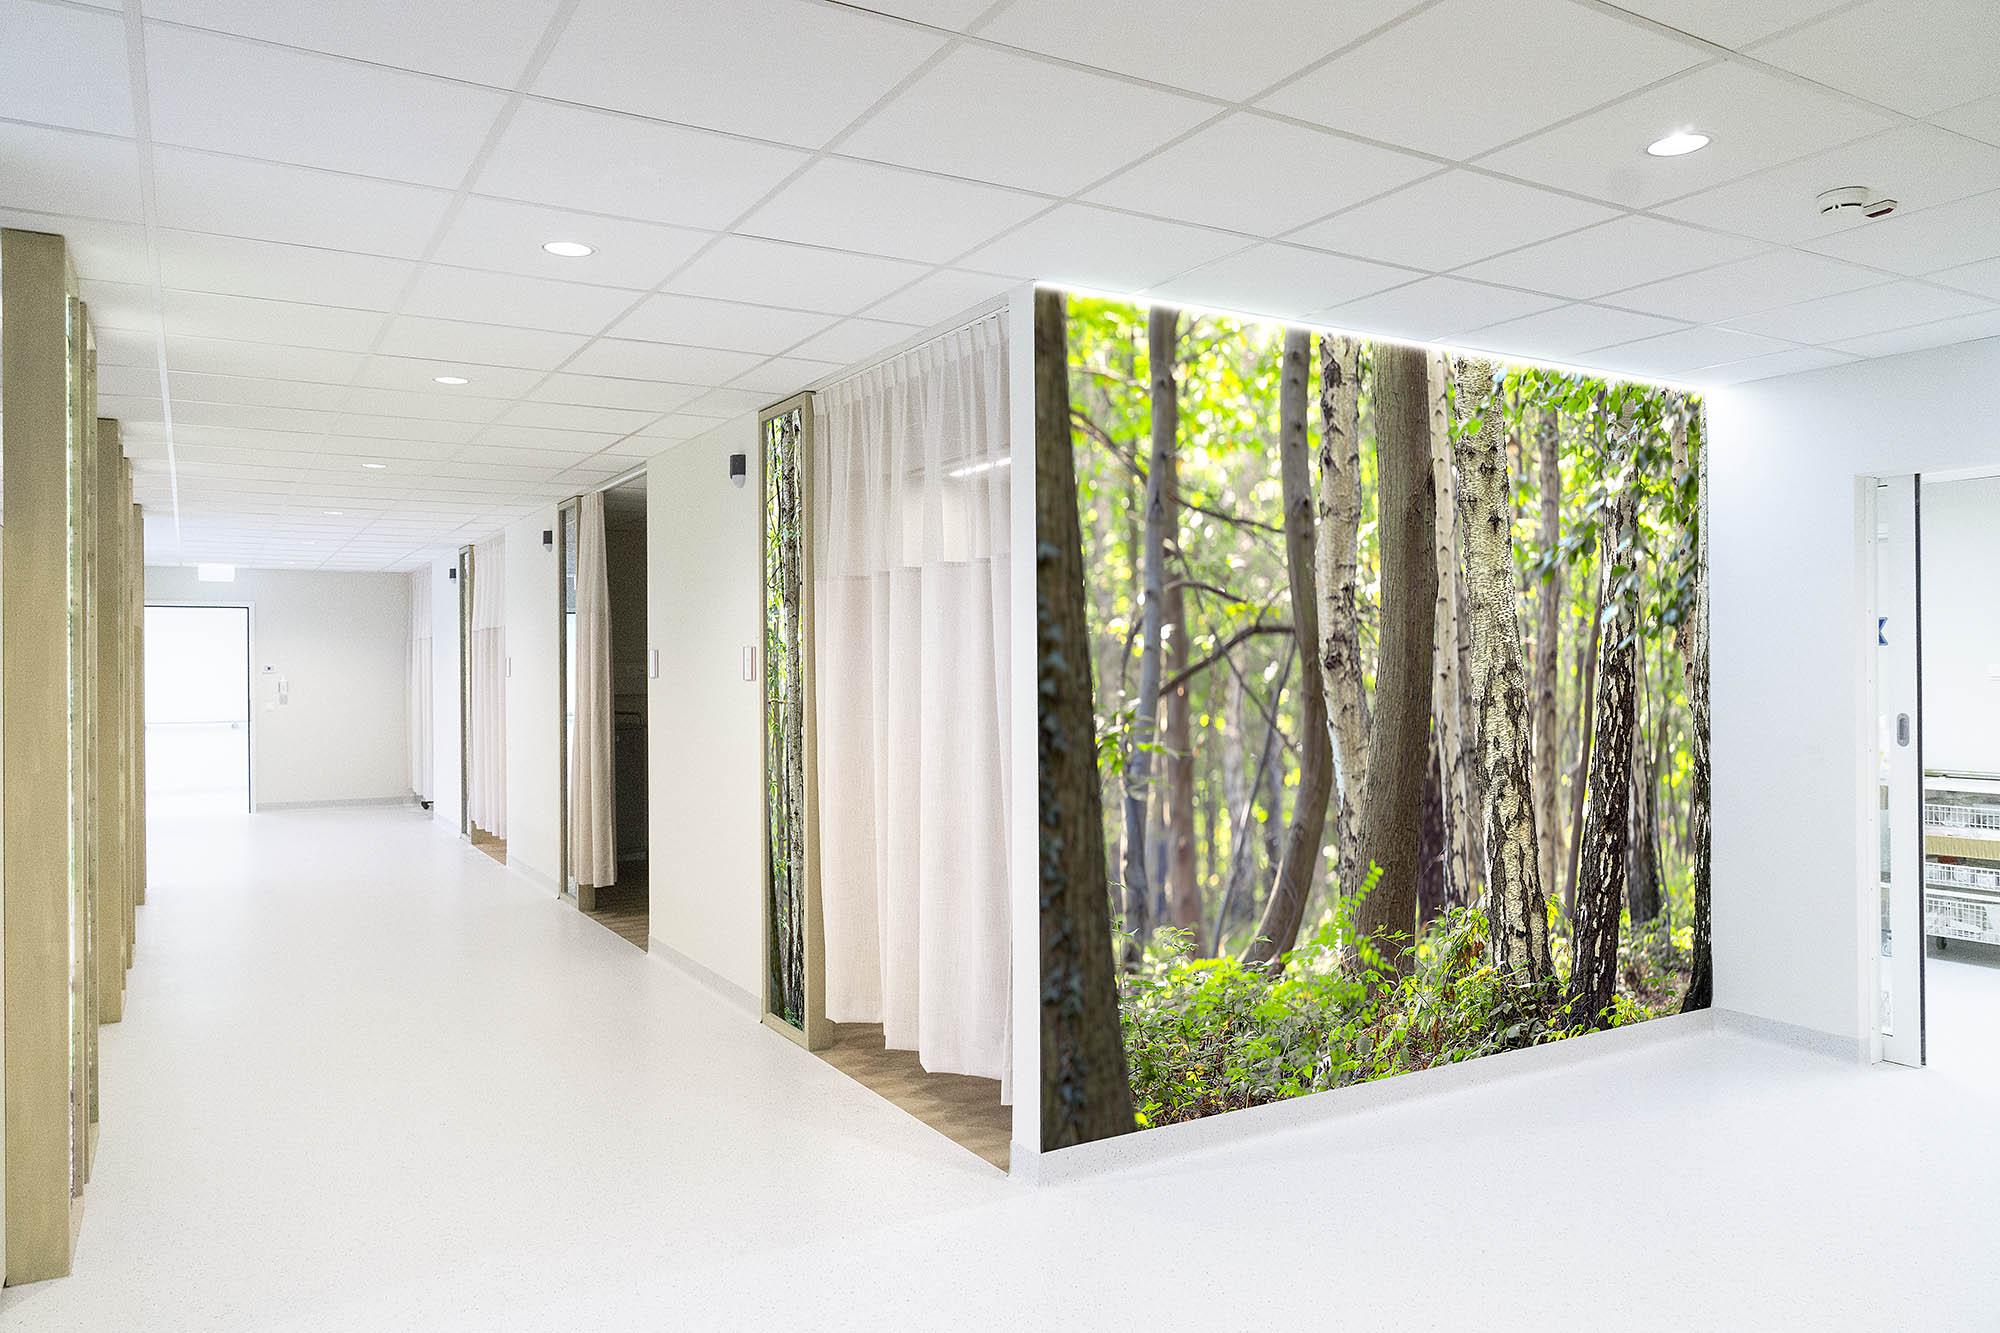 Arthur Los Fotografie-Healing Environment